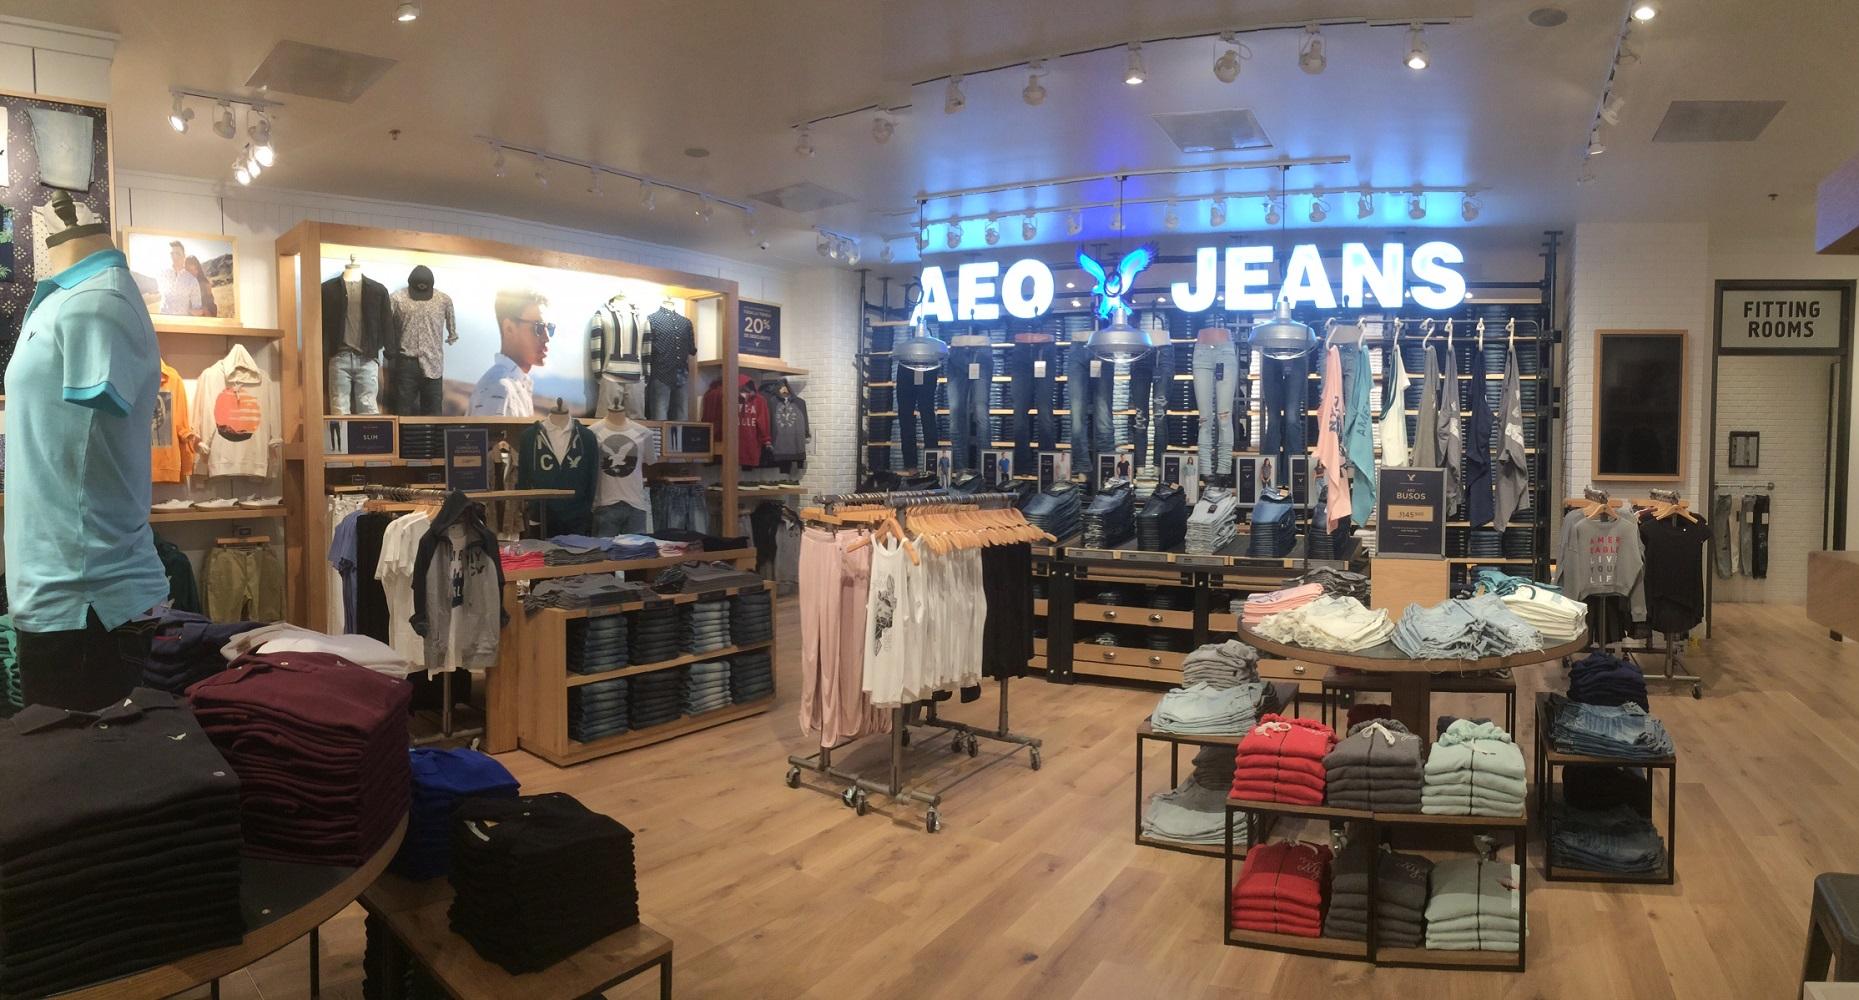 Interior - Clothes Shelves 3.jpg